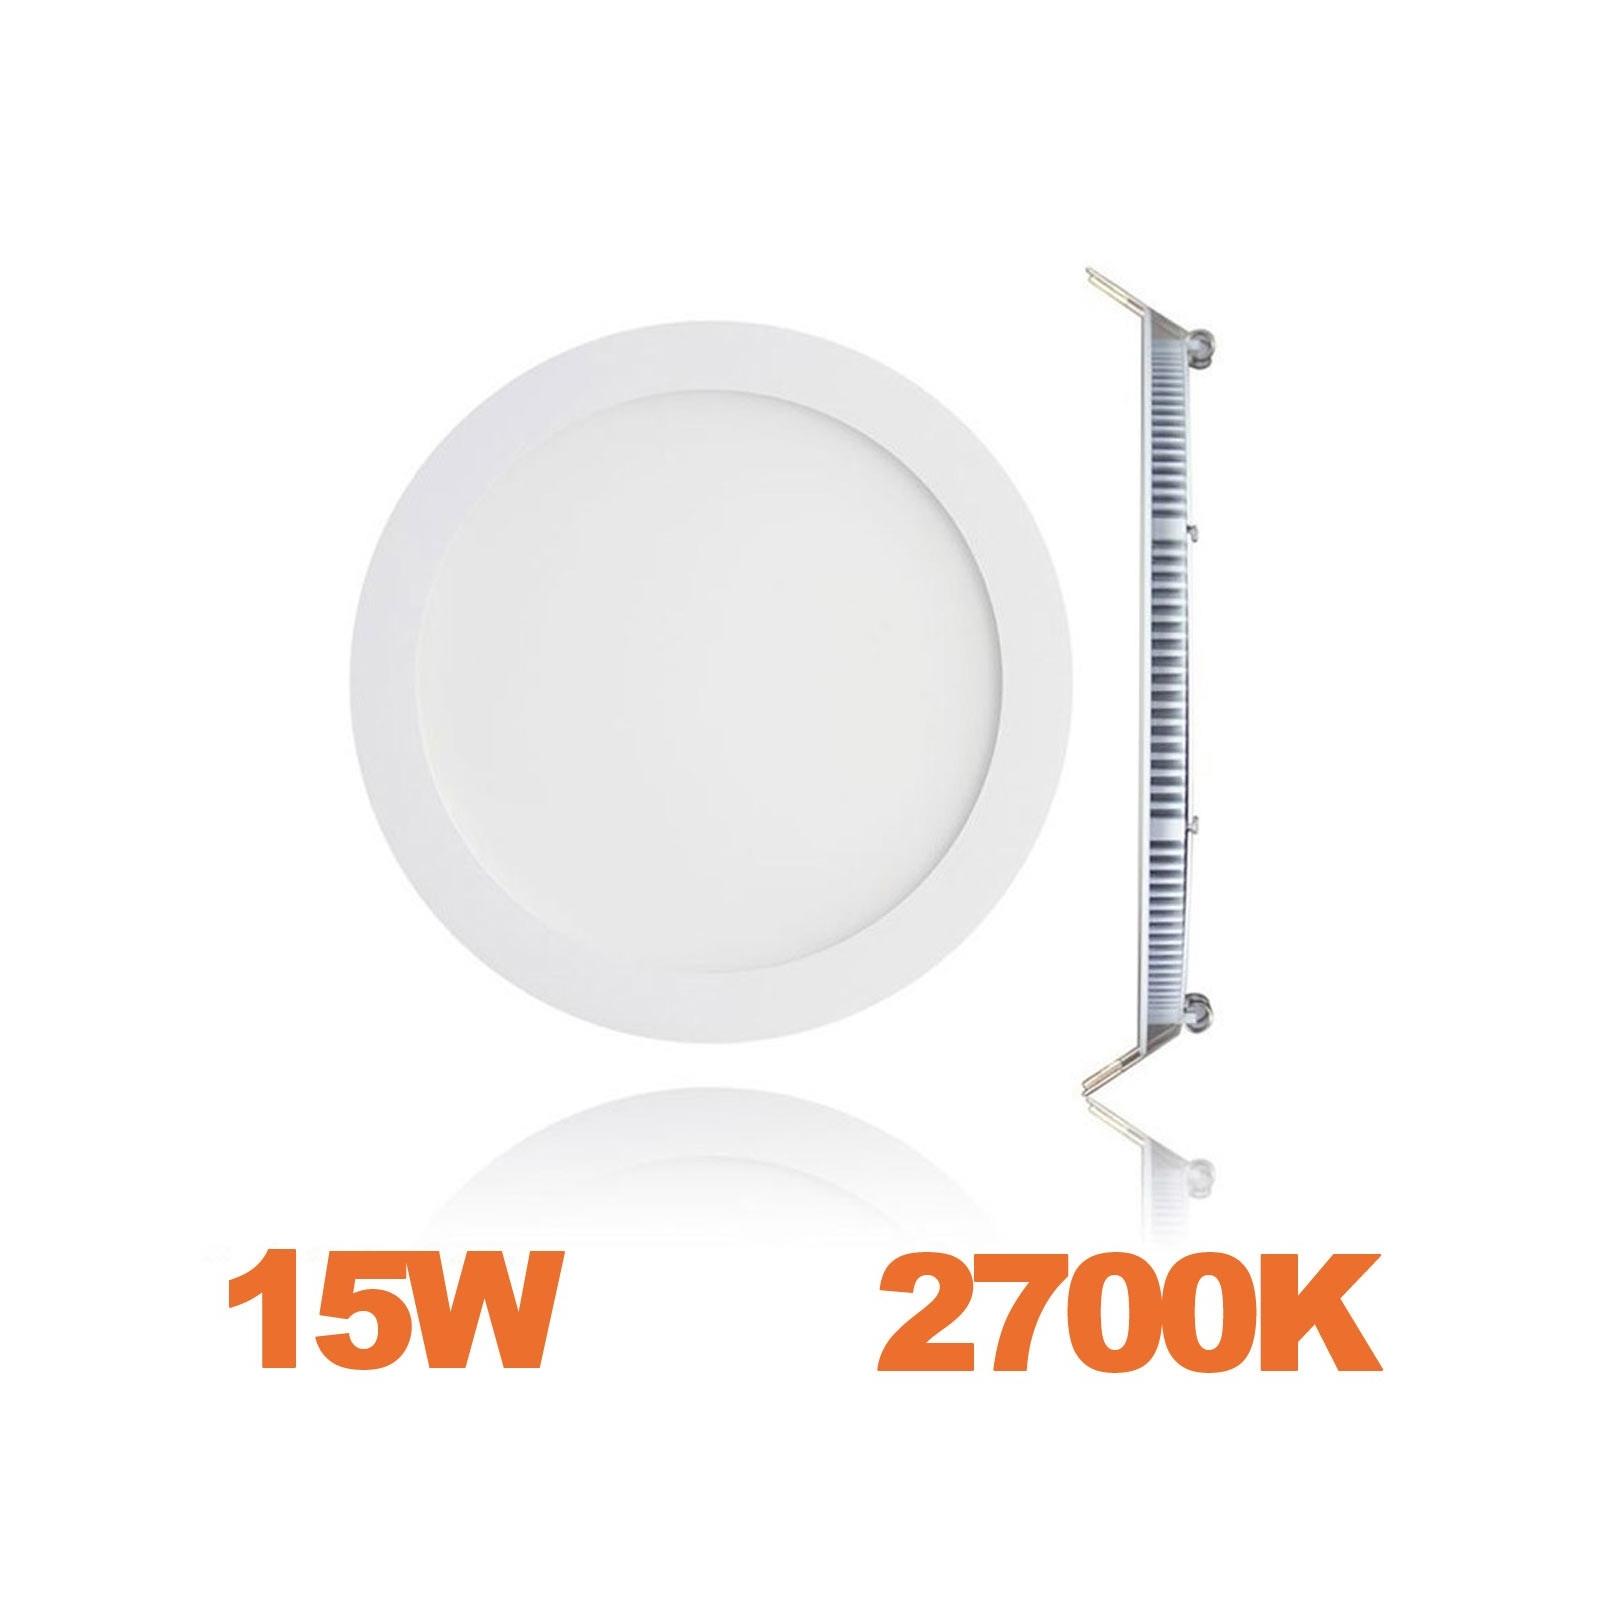 Spot Encastrable LED Downlight Panel Extra-Plat 15W Blanc Chaud 2700K